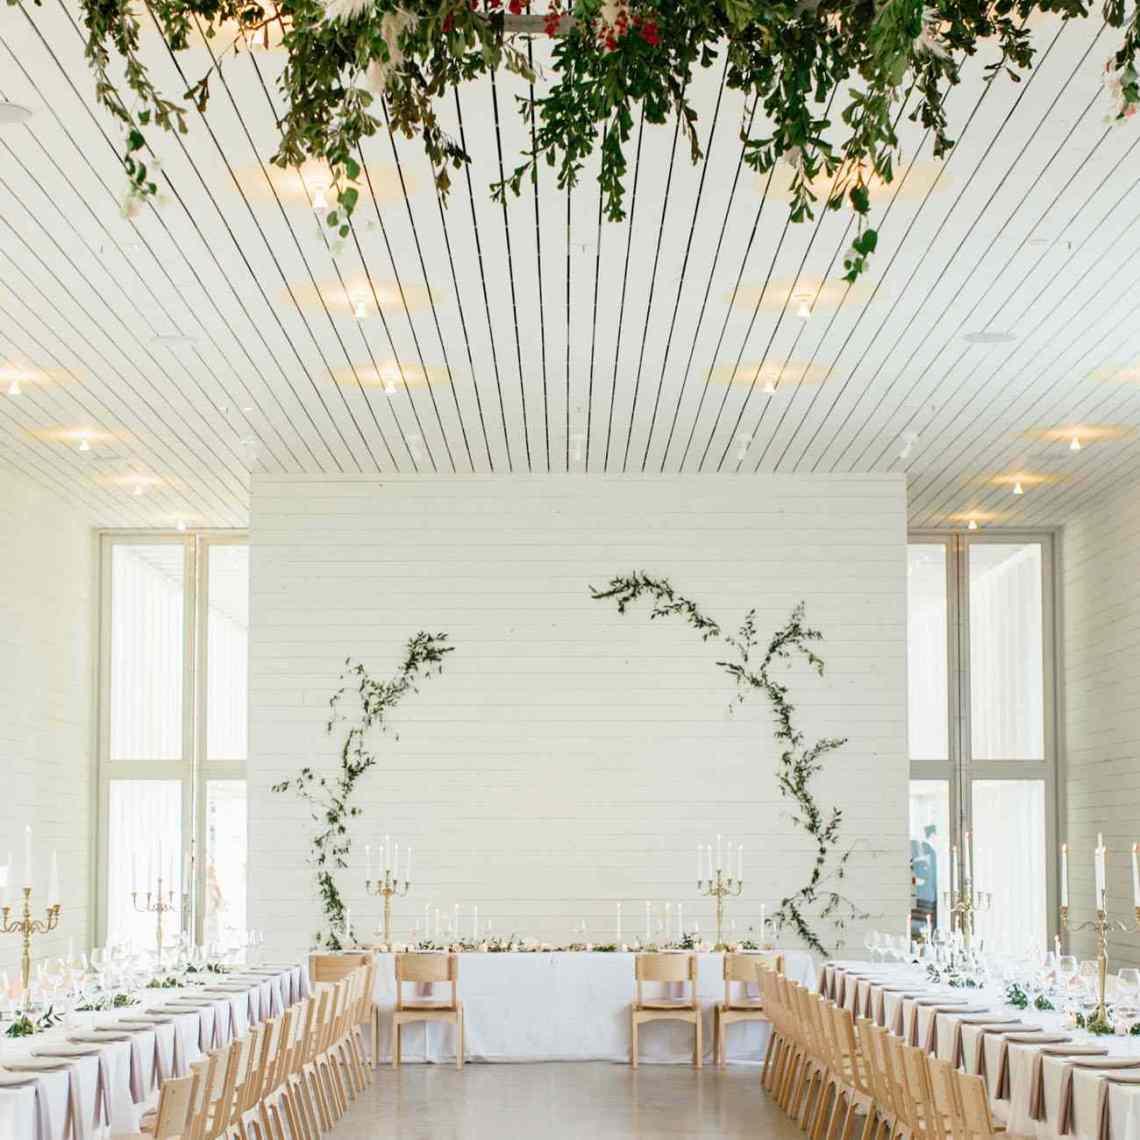 30 Minimalist Wedding Ideas for the Cool Bride